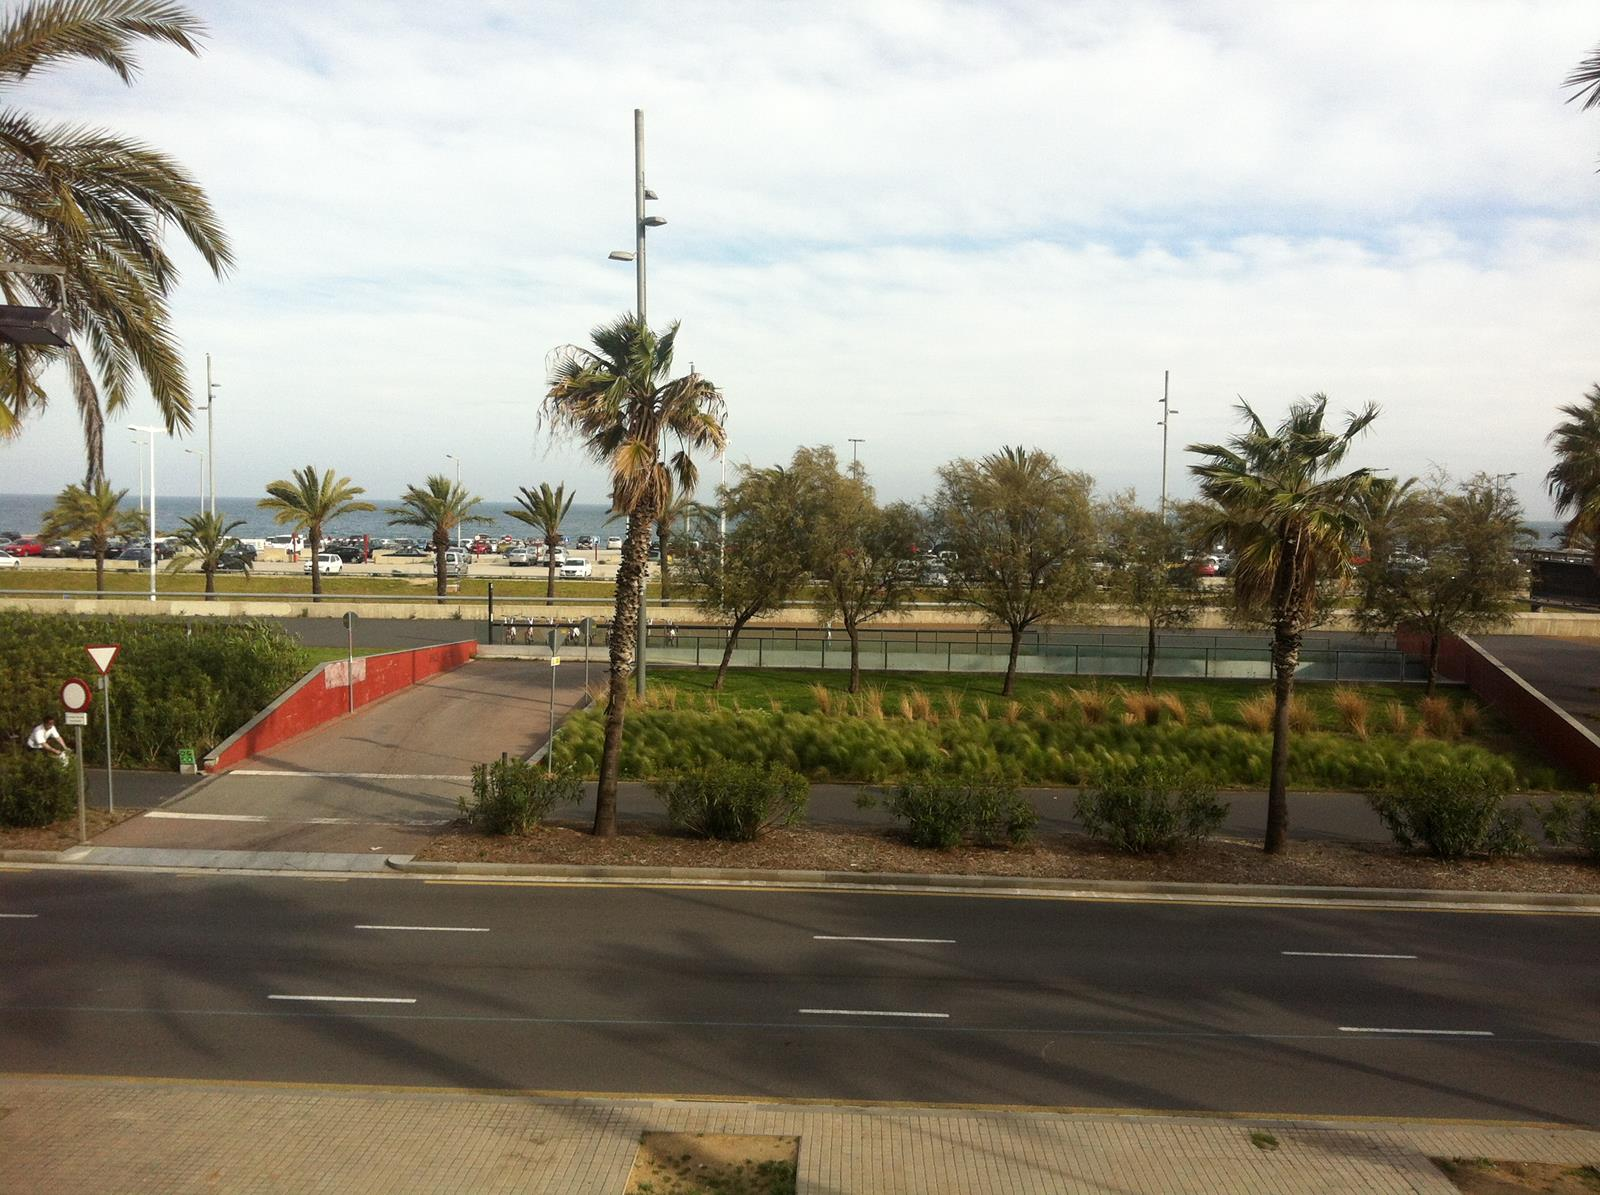 Piso diagonal mar 117 m2 vistas mar jj houses bcn - Pisos diagonal mar ...